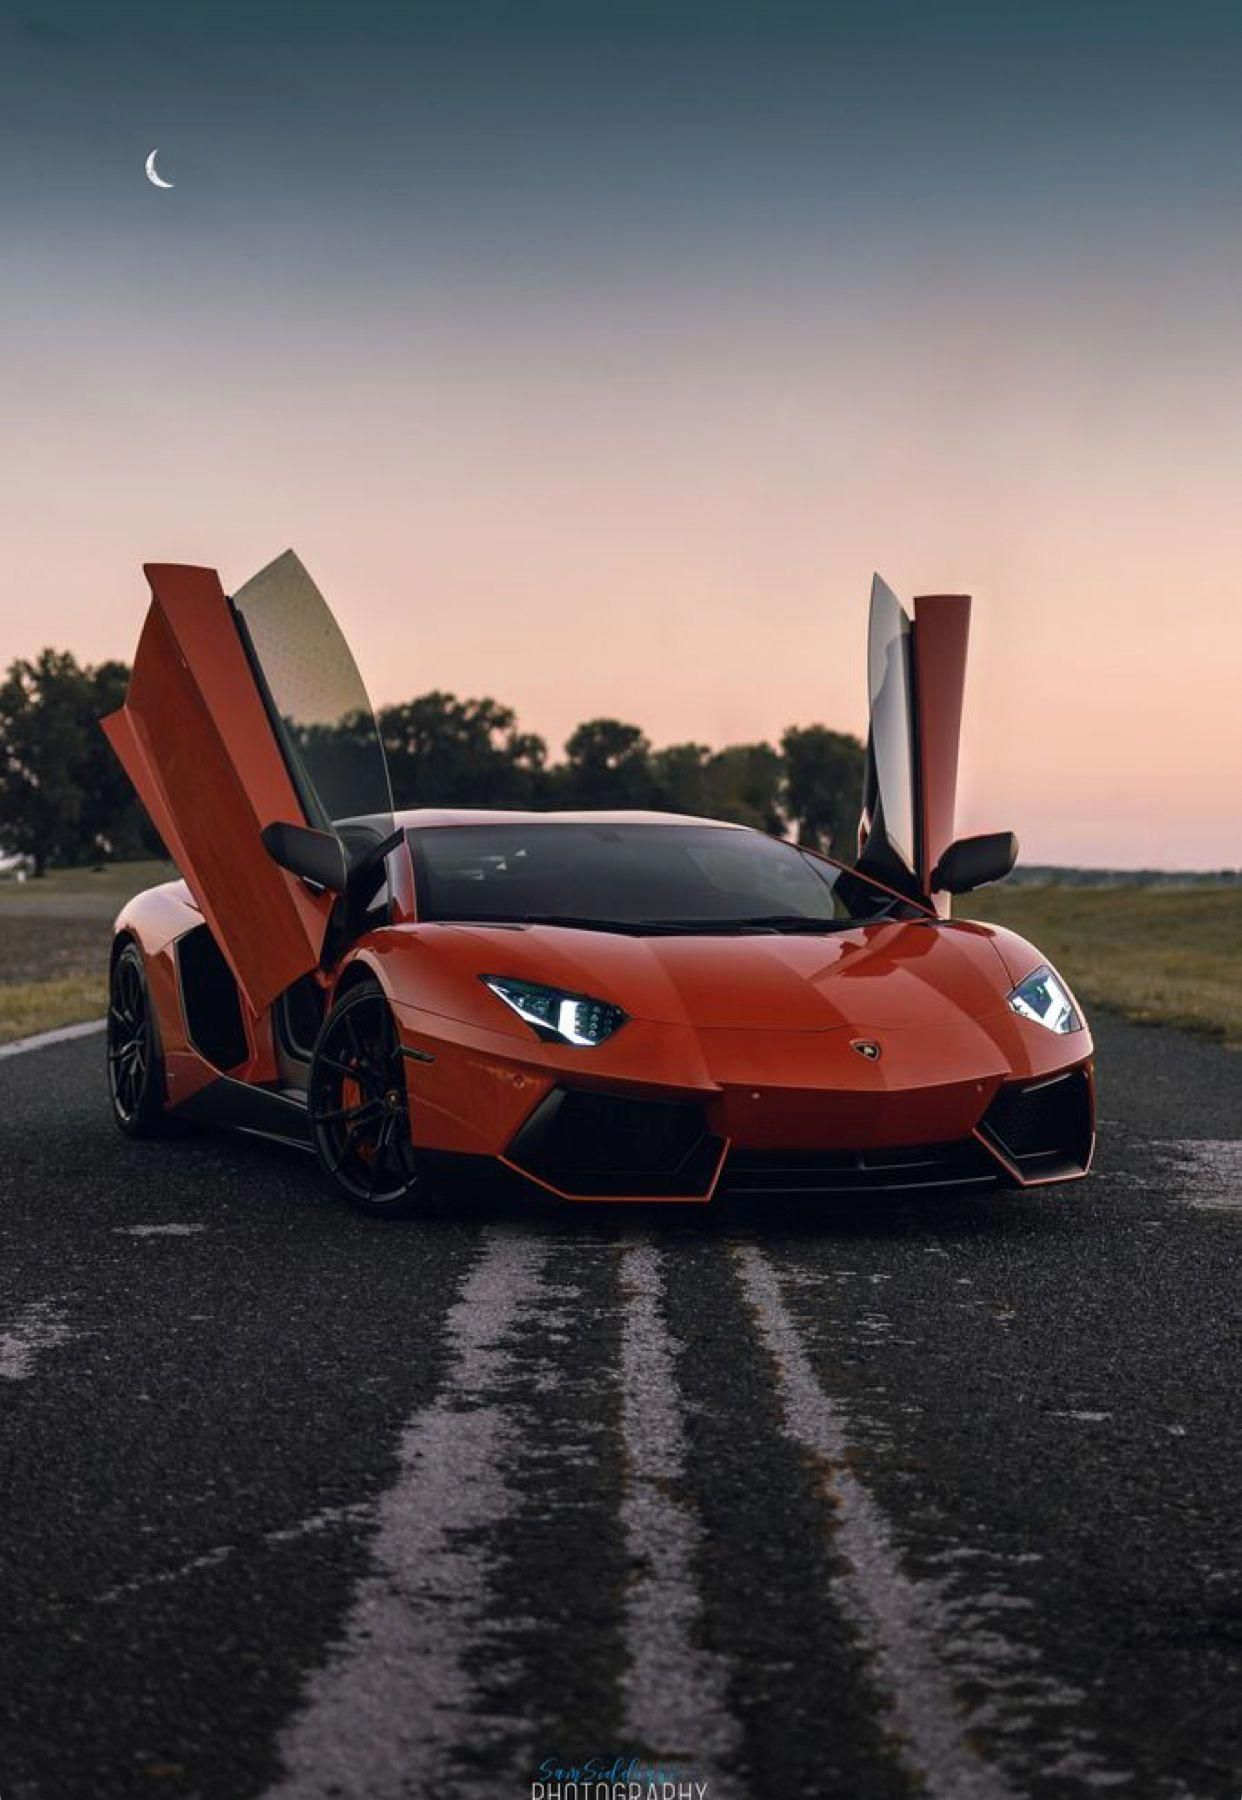 Lamborghini Aventador LP 700-4 #lamborghiniaventador #lamborghiniaventador